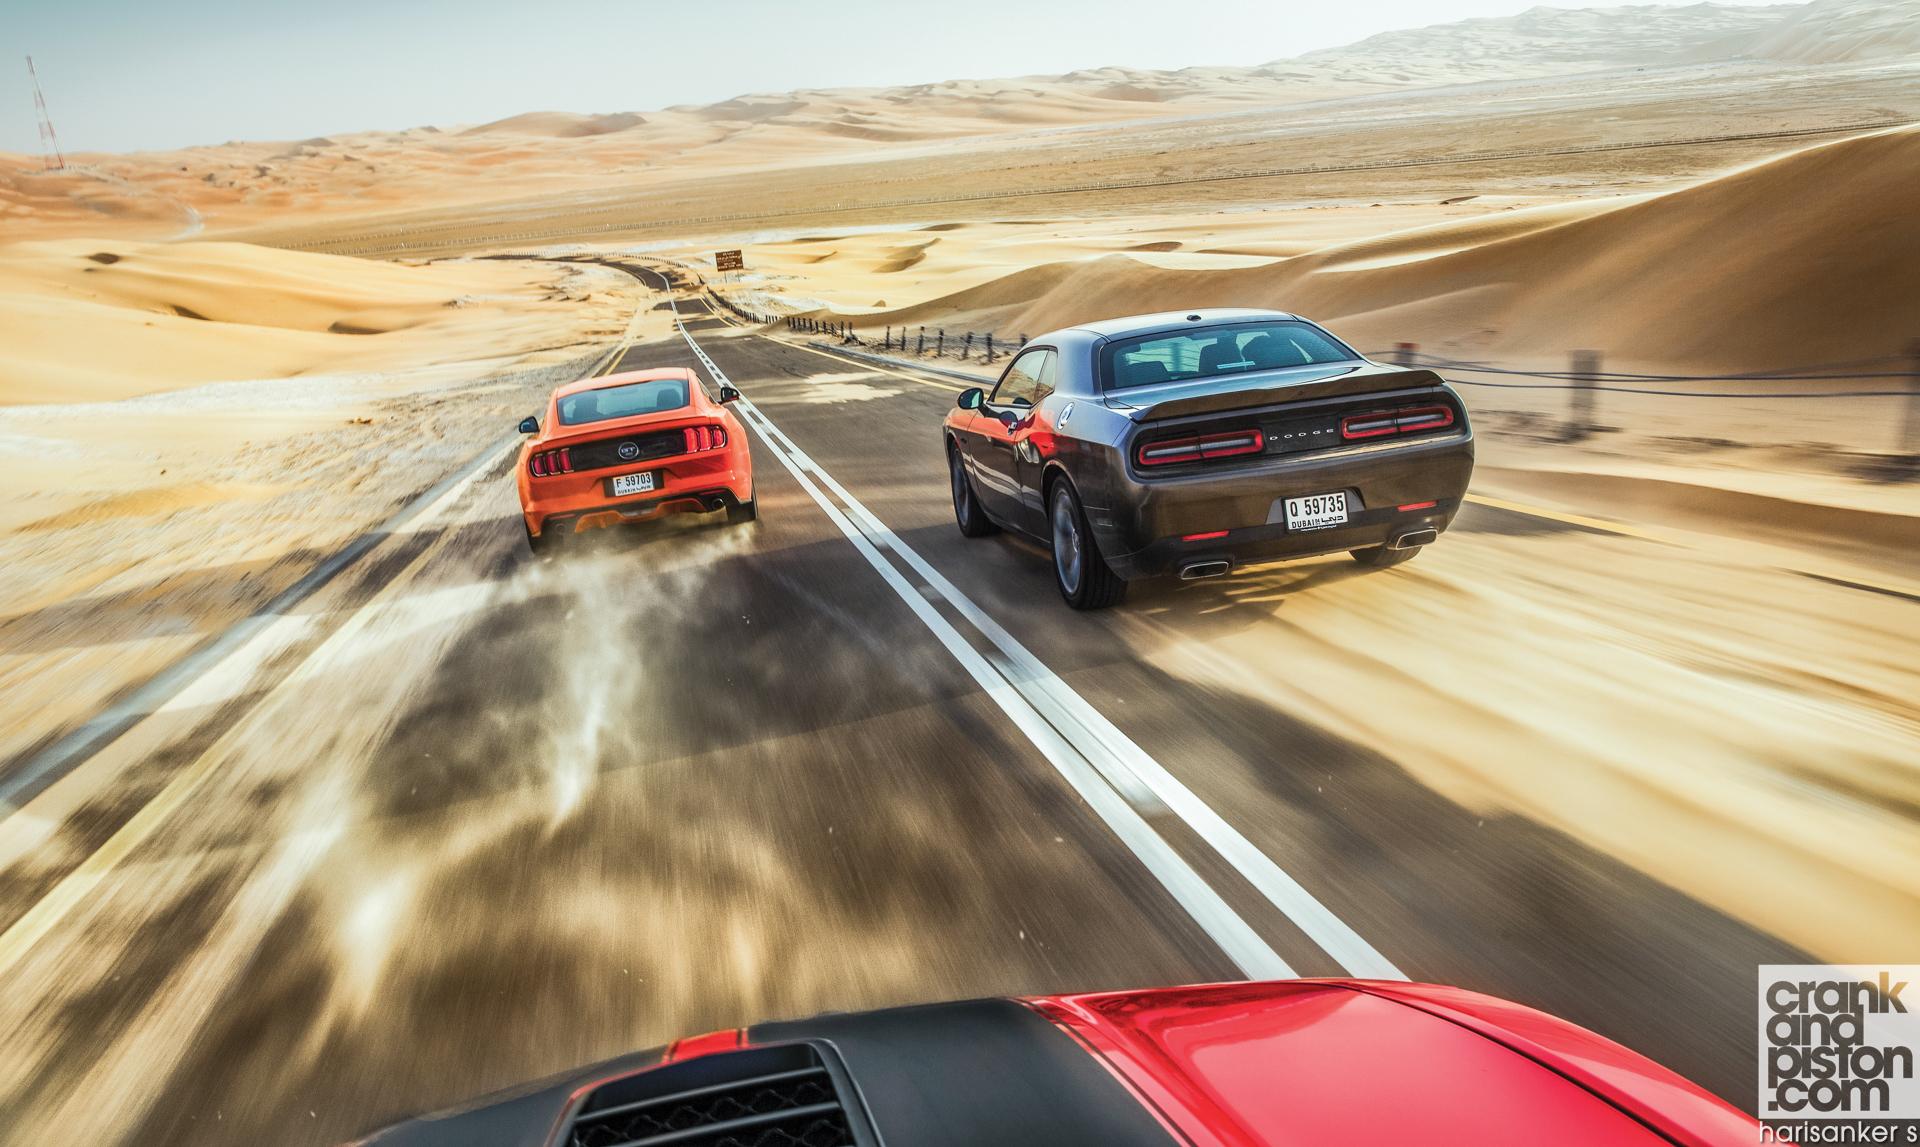 Ford Mustang V Dodge Challenger R T V Chevrolet Camaro Ss Wallpapers on 2016 Camaro Ss Vs Mustang Gt